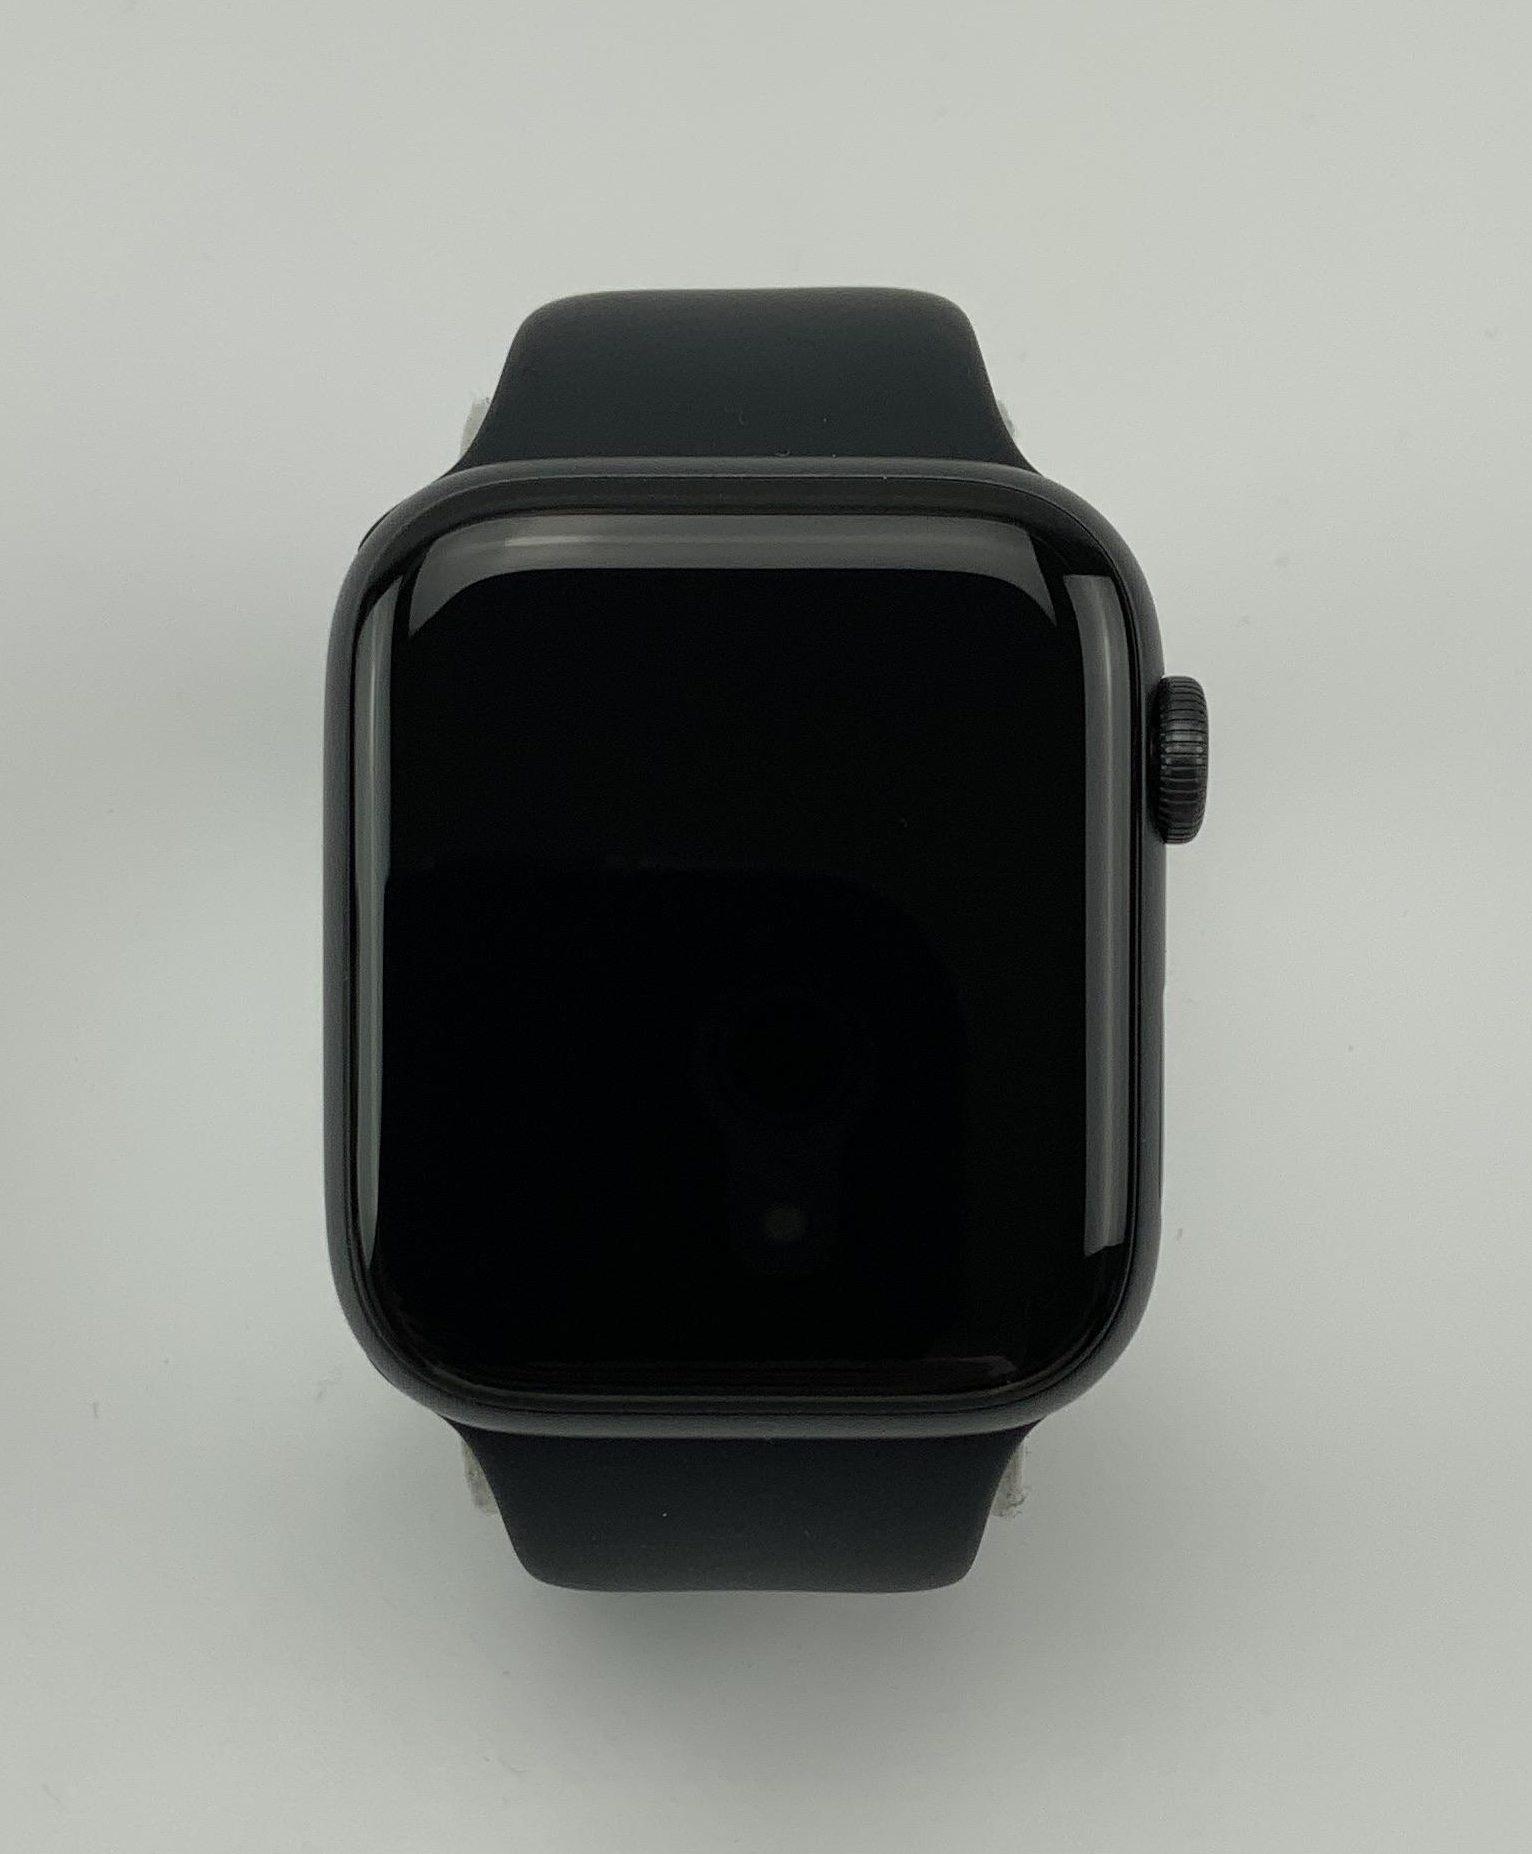 Watch Series 6 Aluminum Cellular (44mm), Space Gray, imagen 1